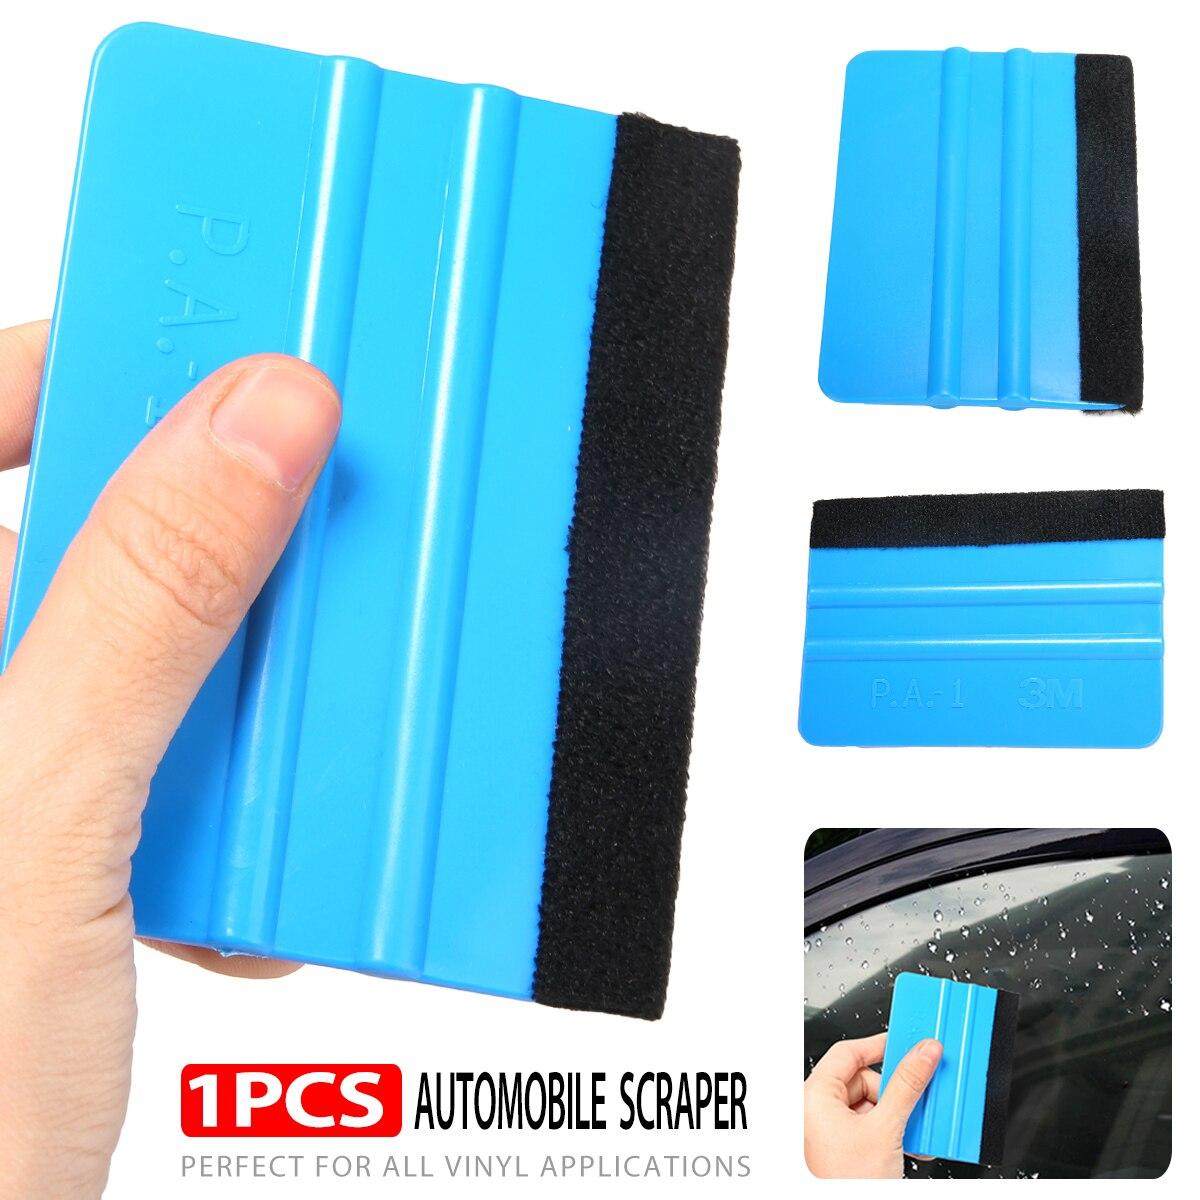 10x7.5cm Blue Plastic Car Vinyl Squeegee Blade Soft Felt Edge Decal Wrap Scraper For Auto Vinyl Application Tool